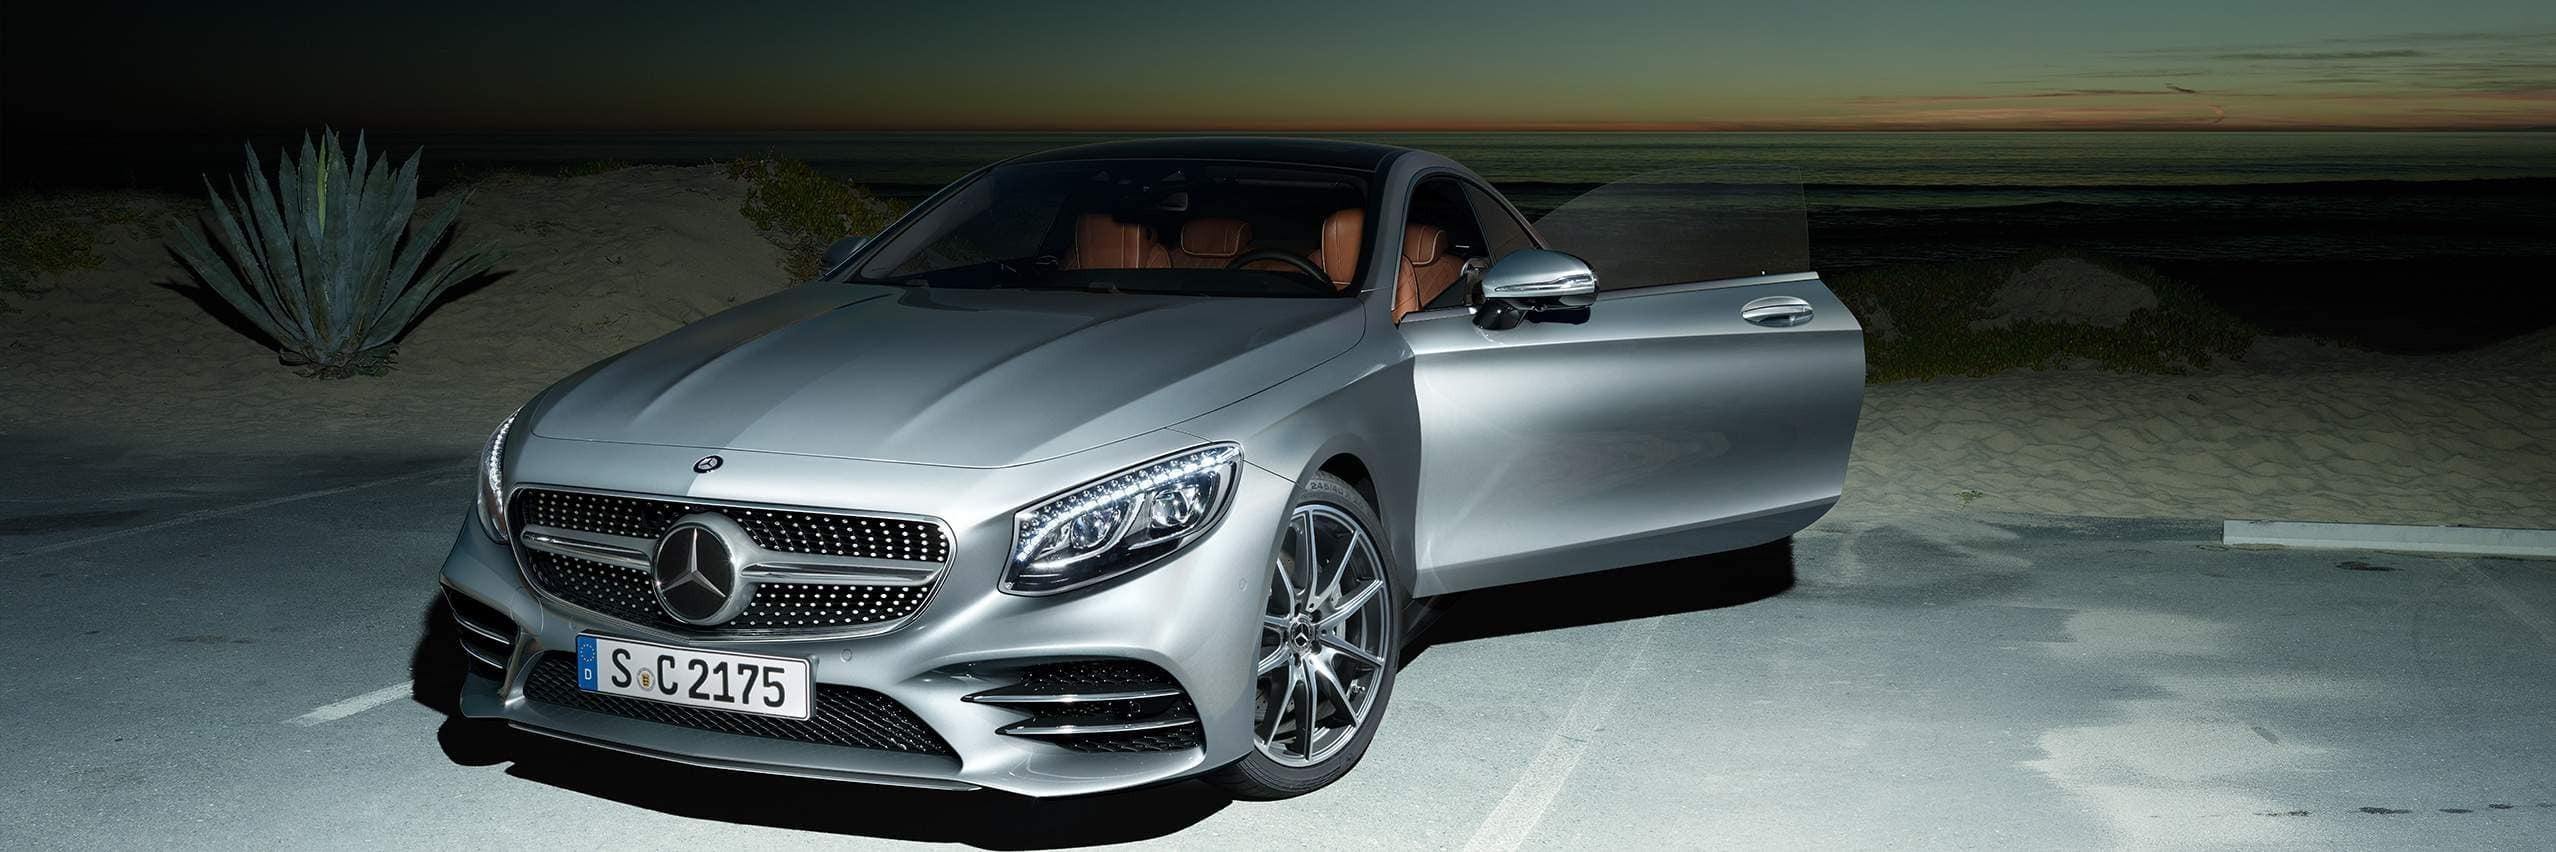 Технические данные Mercedes-Benz S-Class Coupe